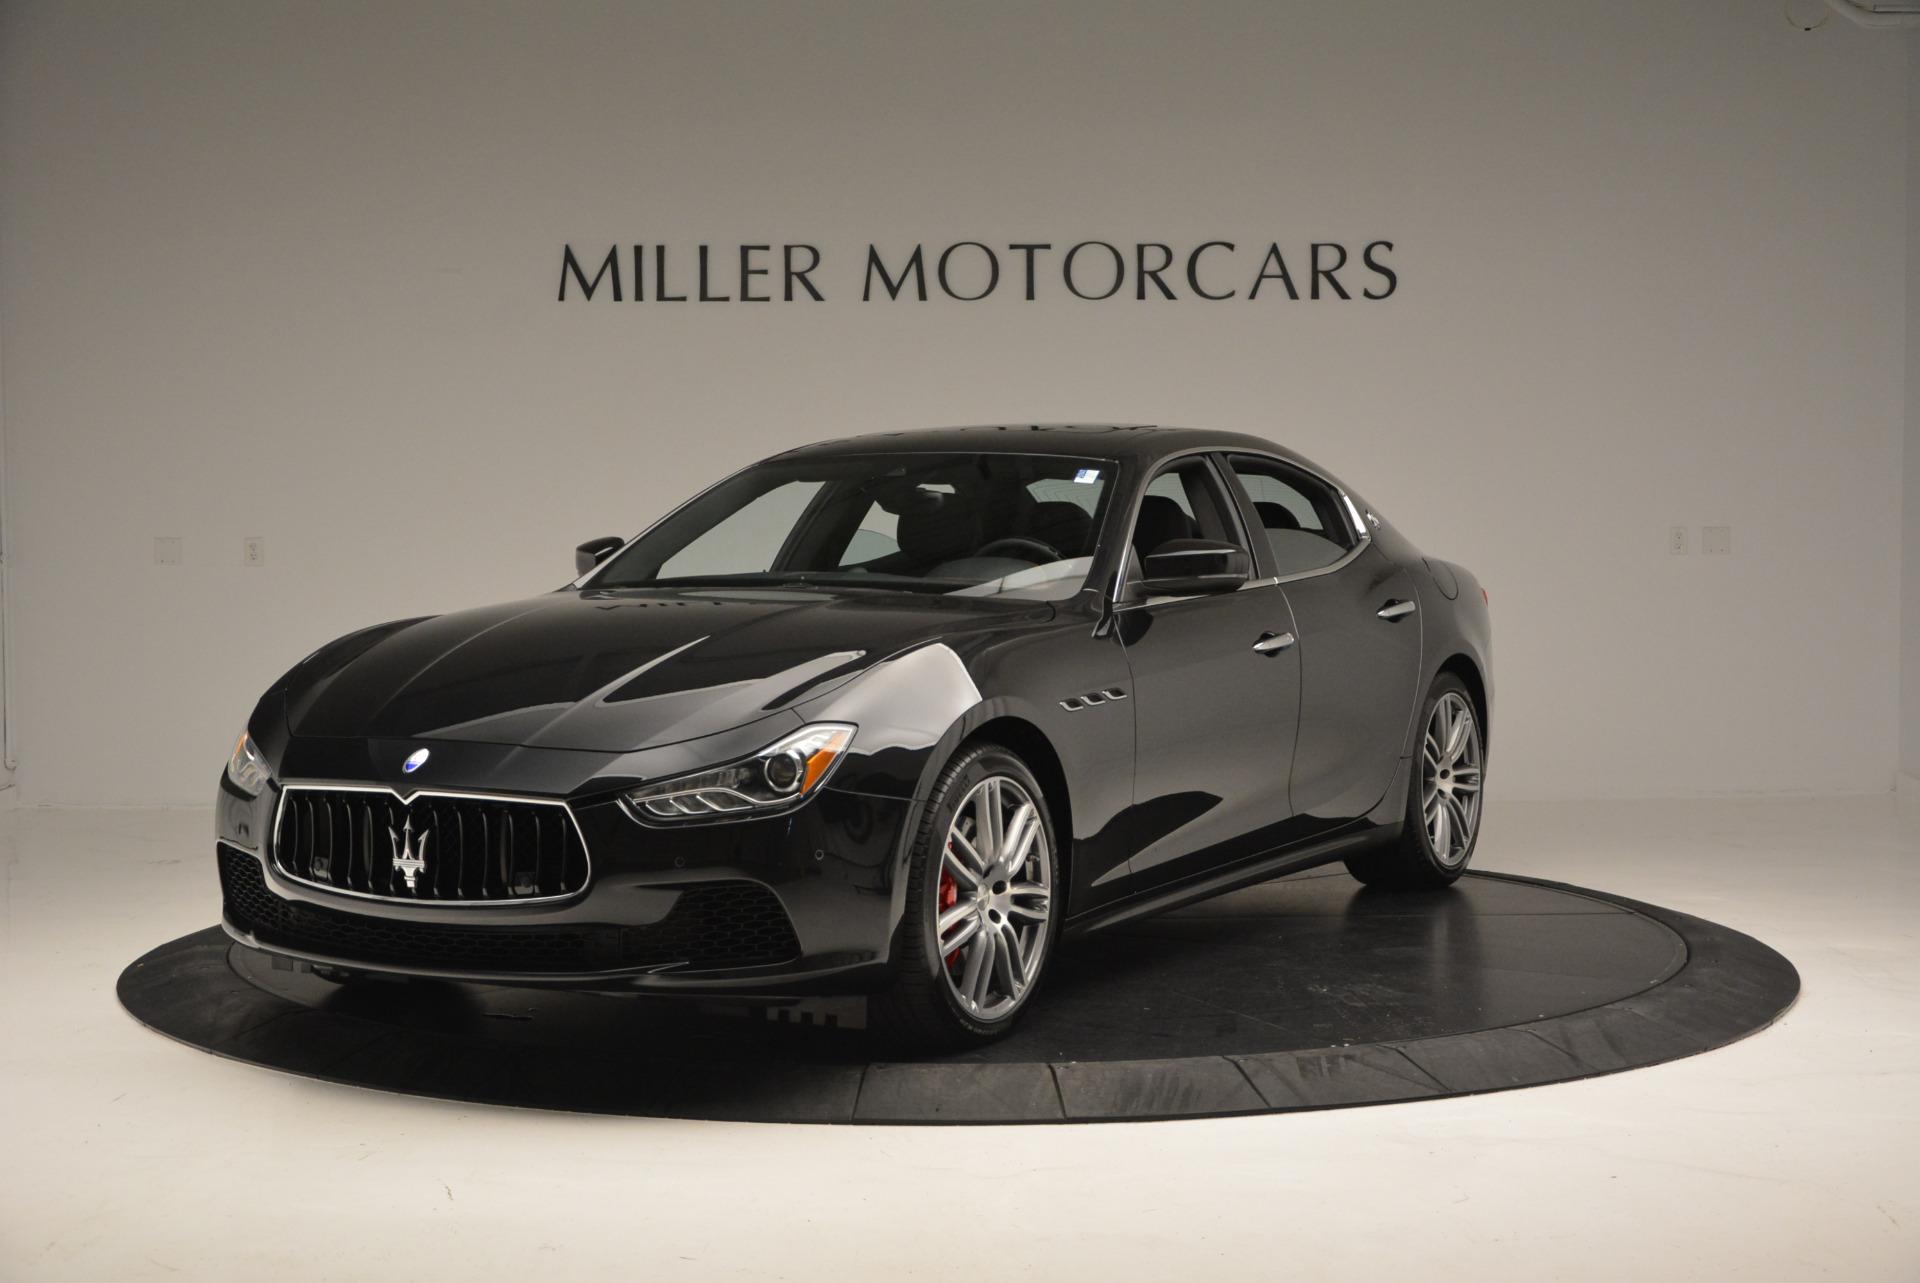 New 2017 Maserati Ghibli S Q4 for sale Sold at Maserati of Westport in Westport CT 06880 1